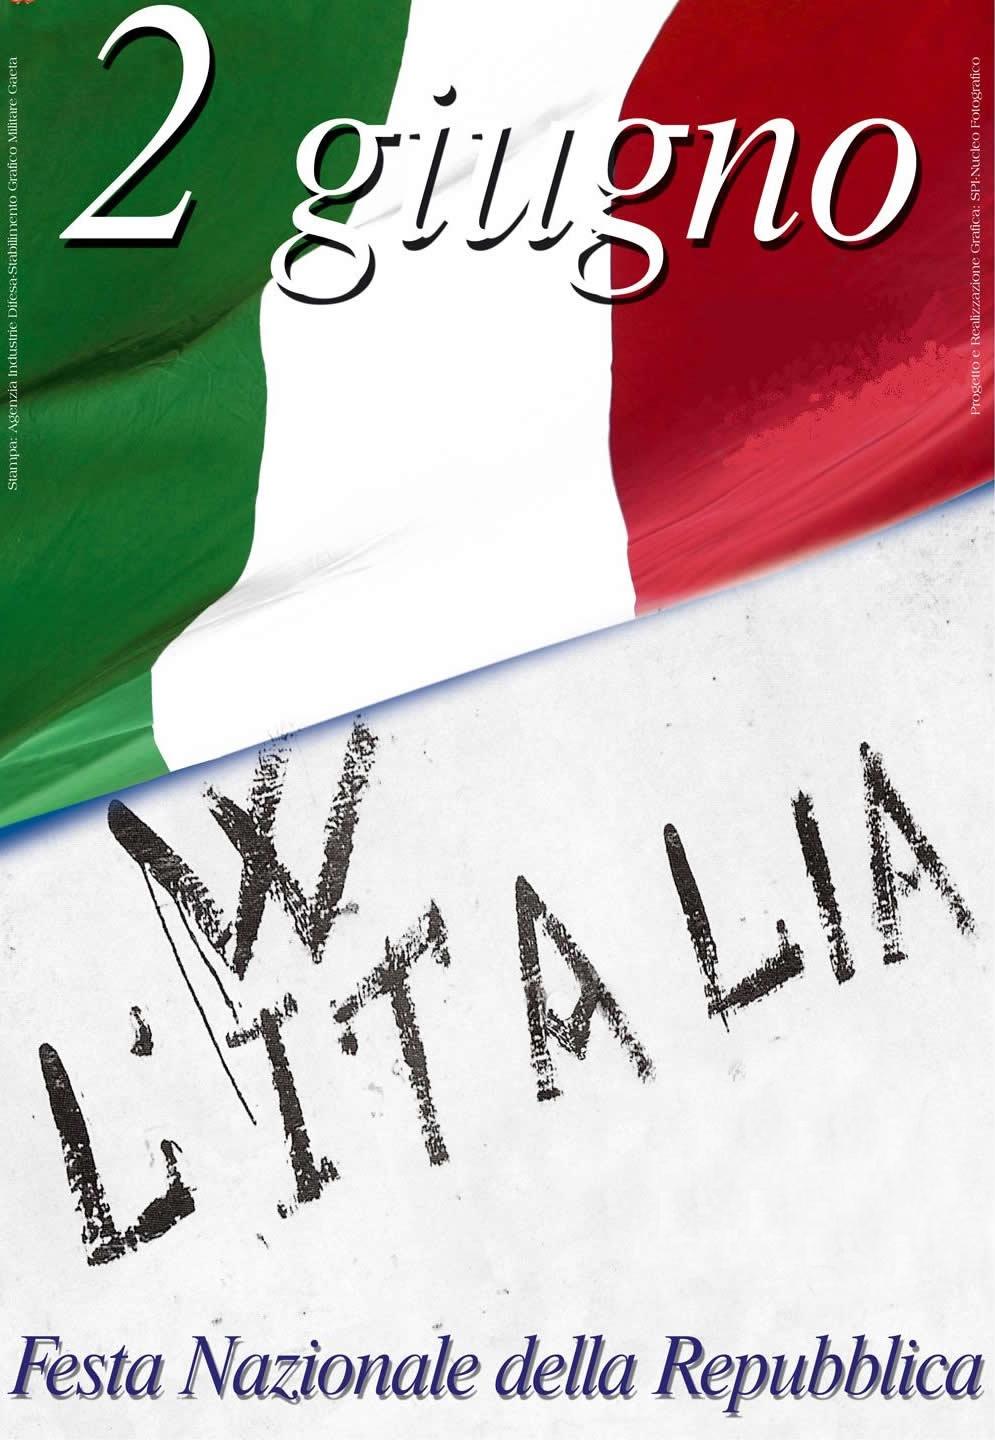 Embo for Repubblica homepage it